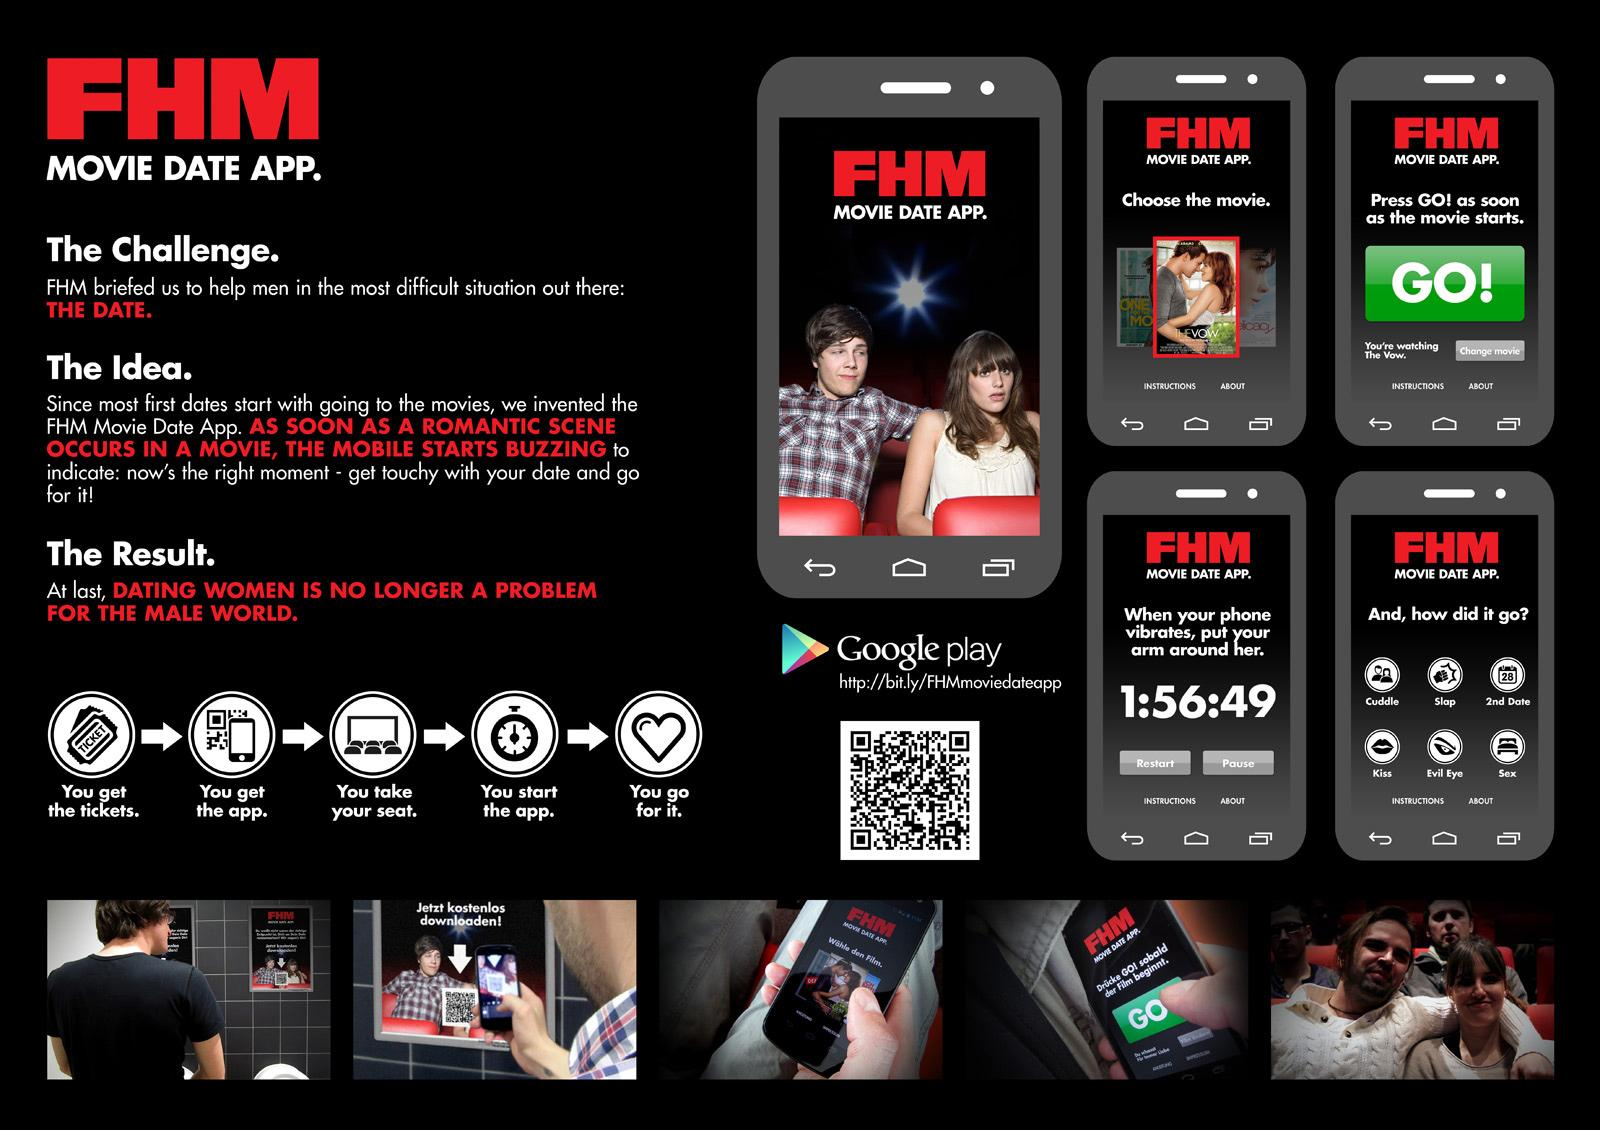 FHM Digital Ad -  Movie Date App